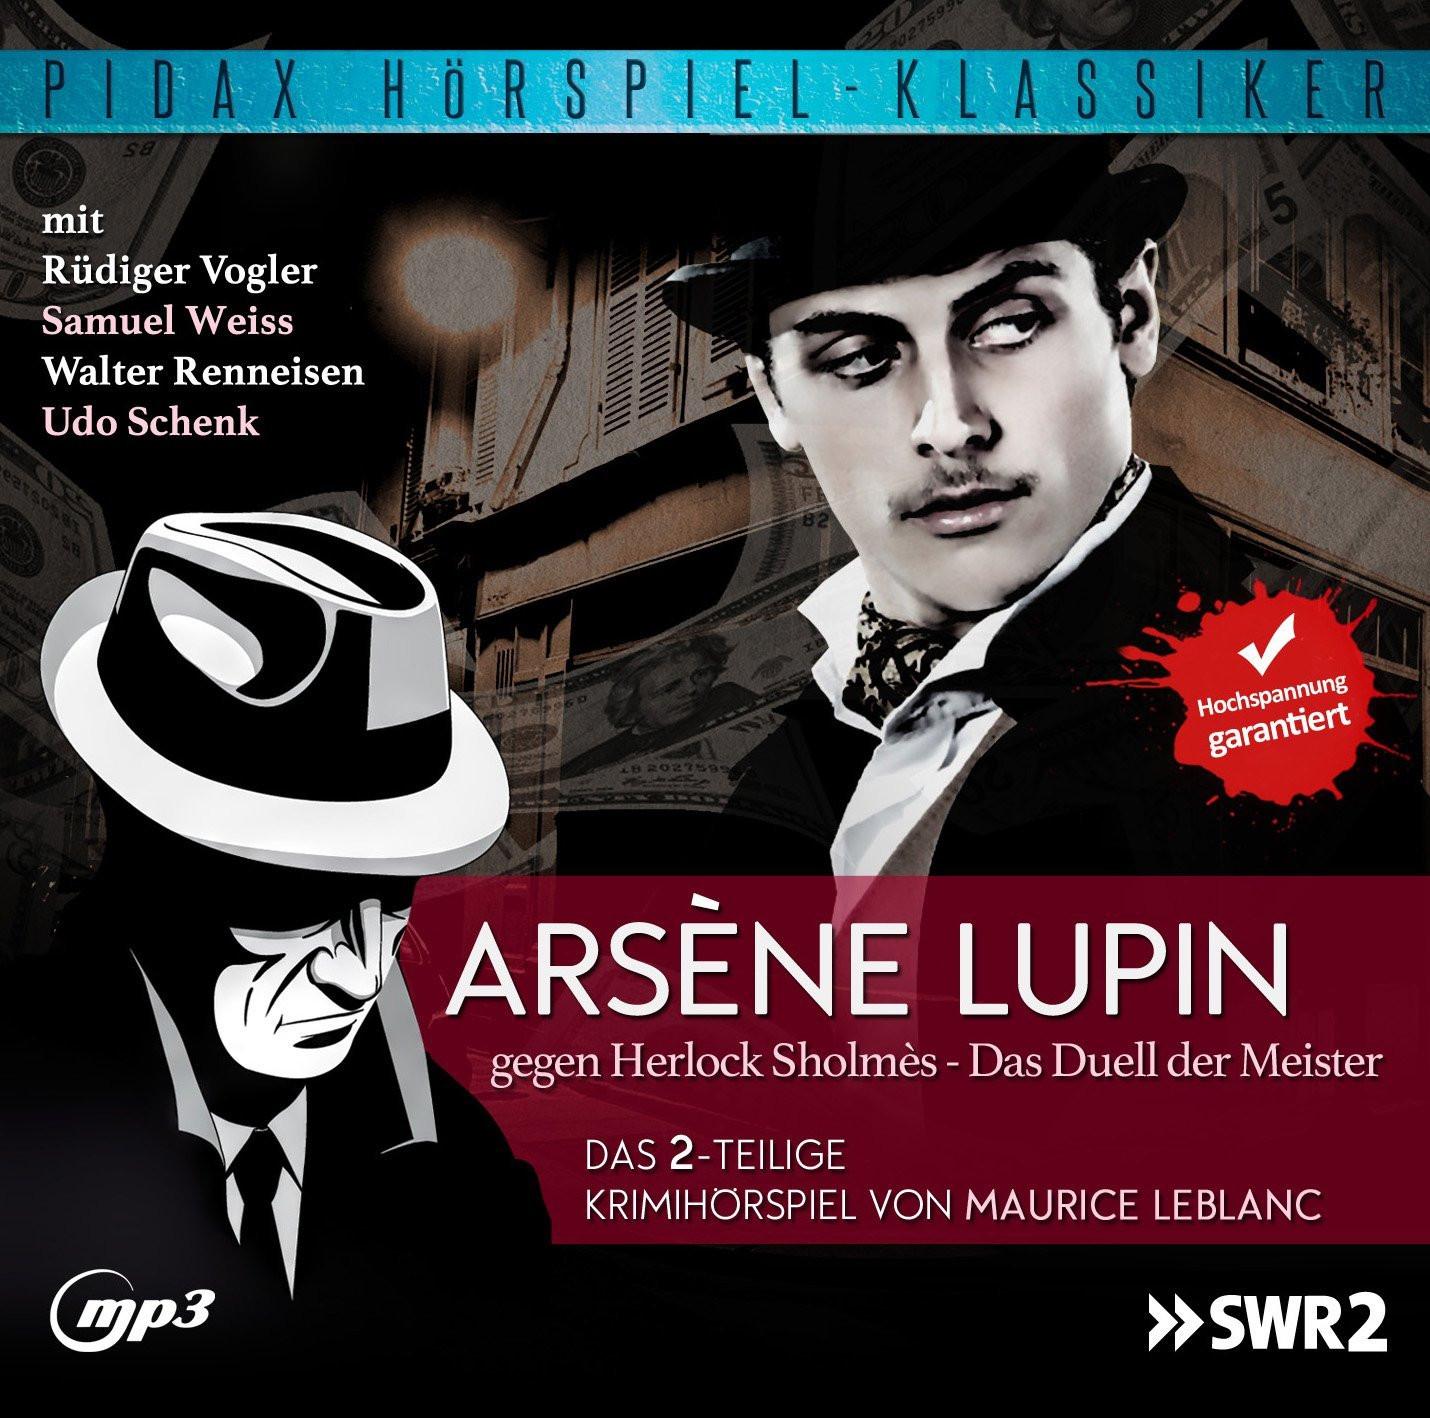 Pidax Hörspiel Klassiker - Arsène Lupin gegen Herlock Sholmès